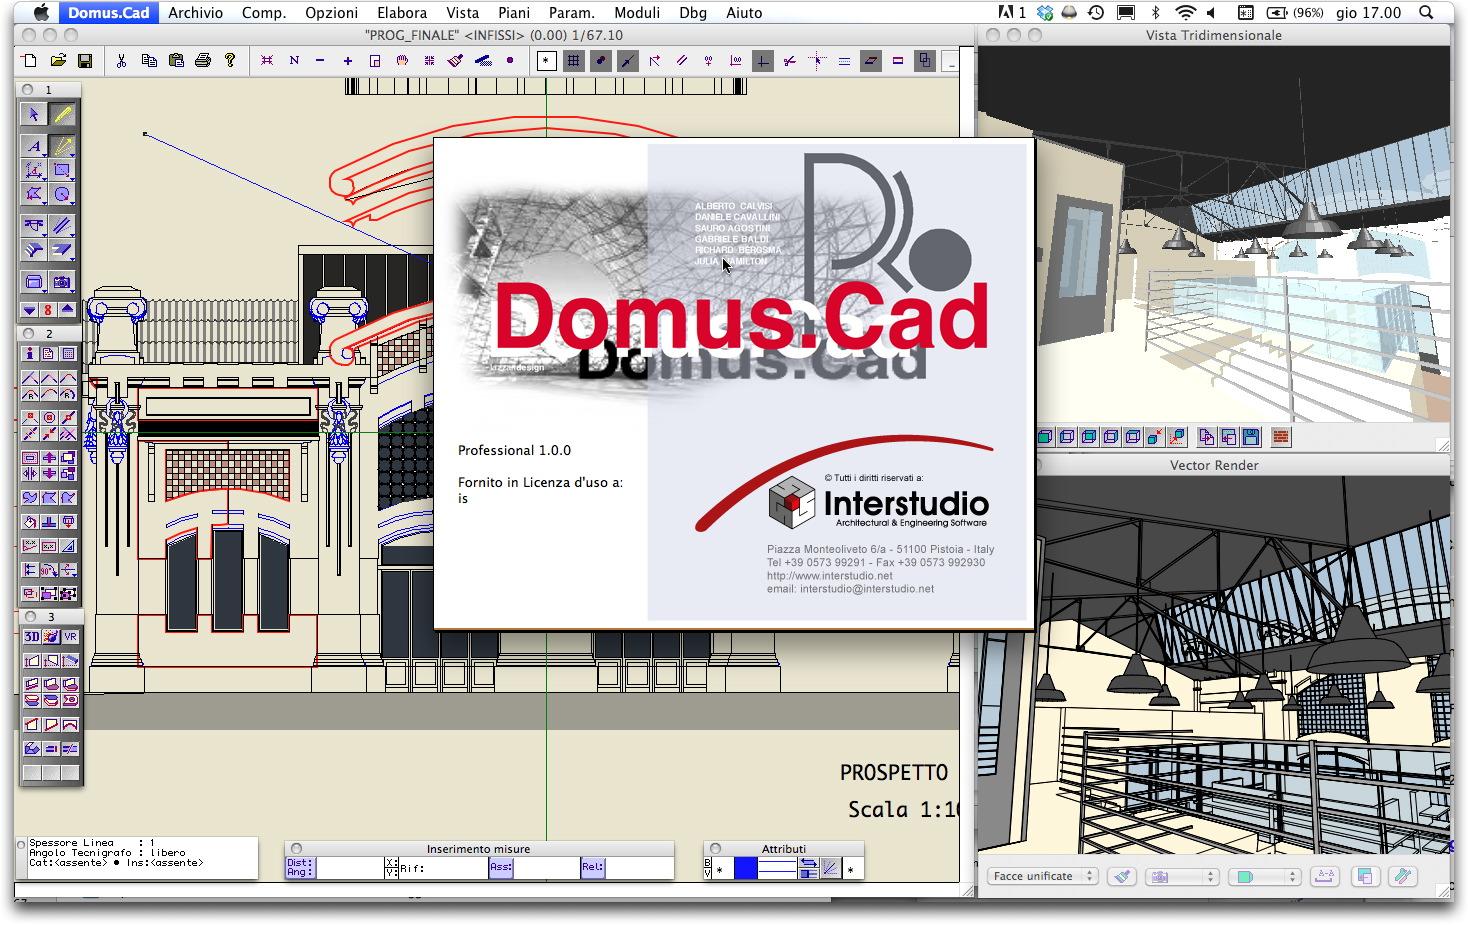 Interstudio domus cad pro cad bim architettonico 3d for Programma per 3d interni